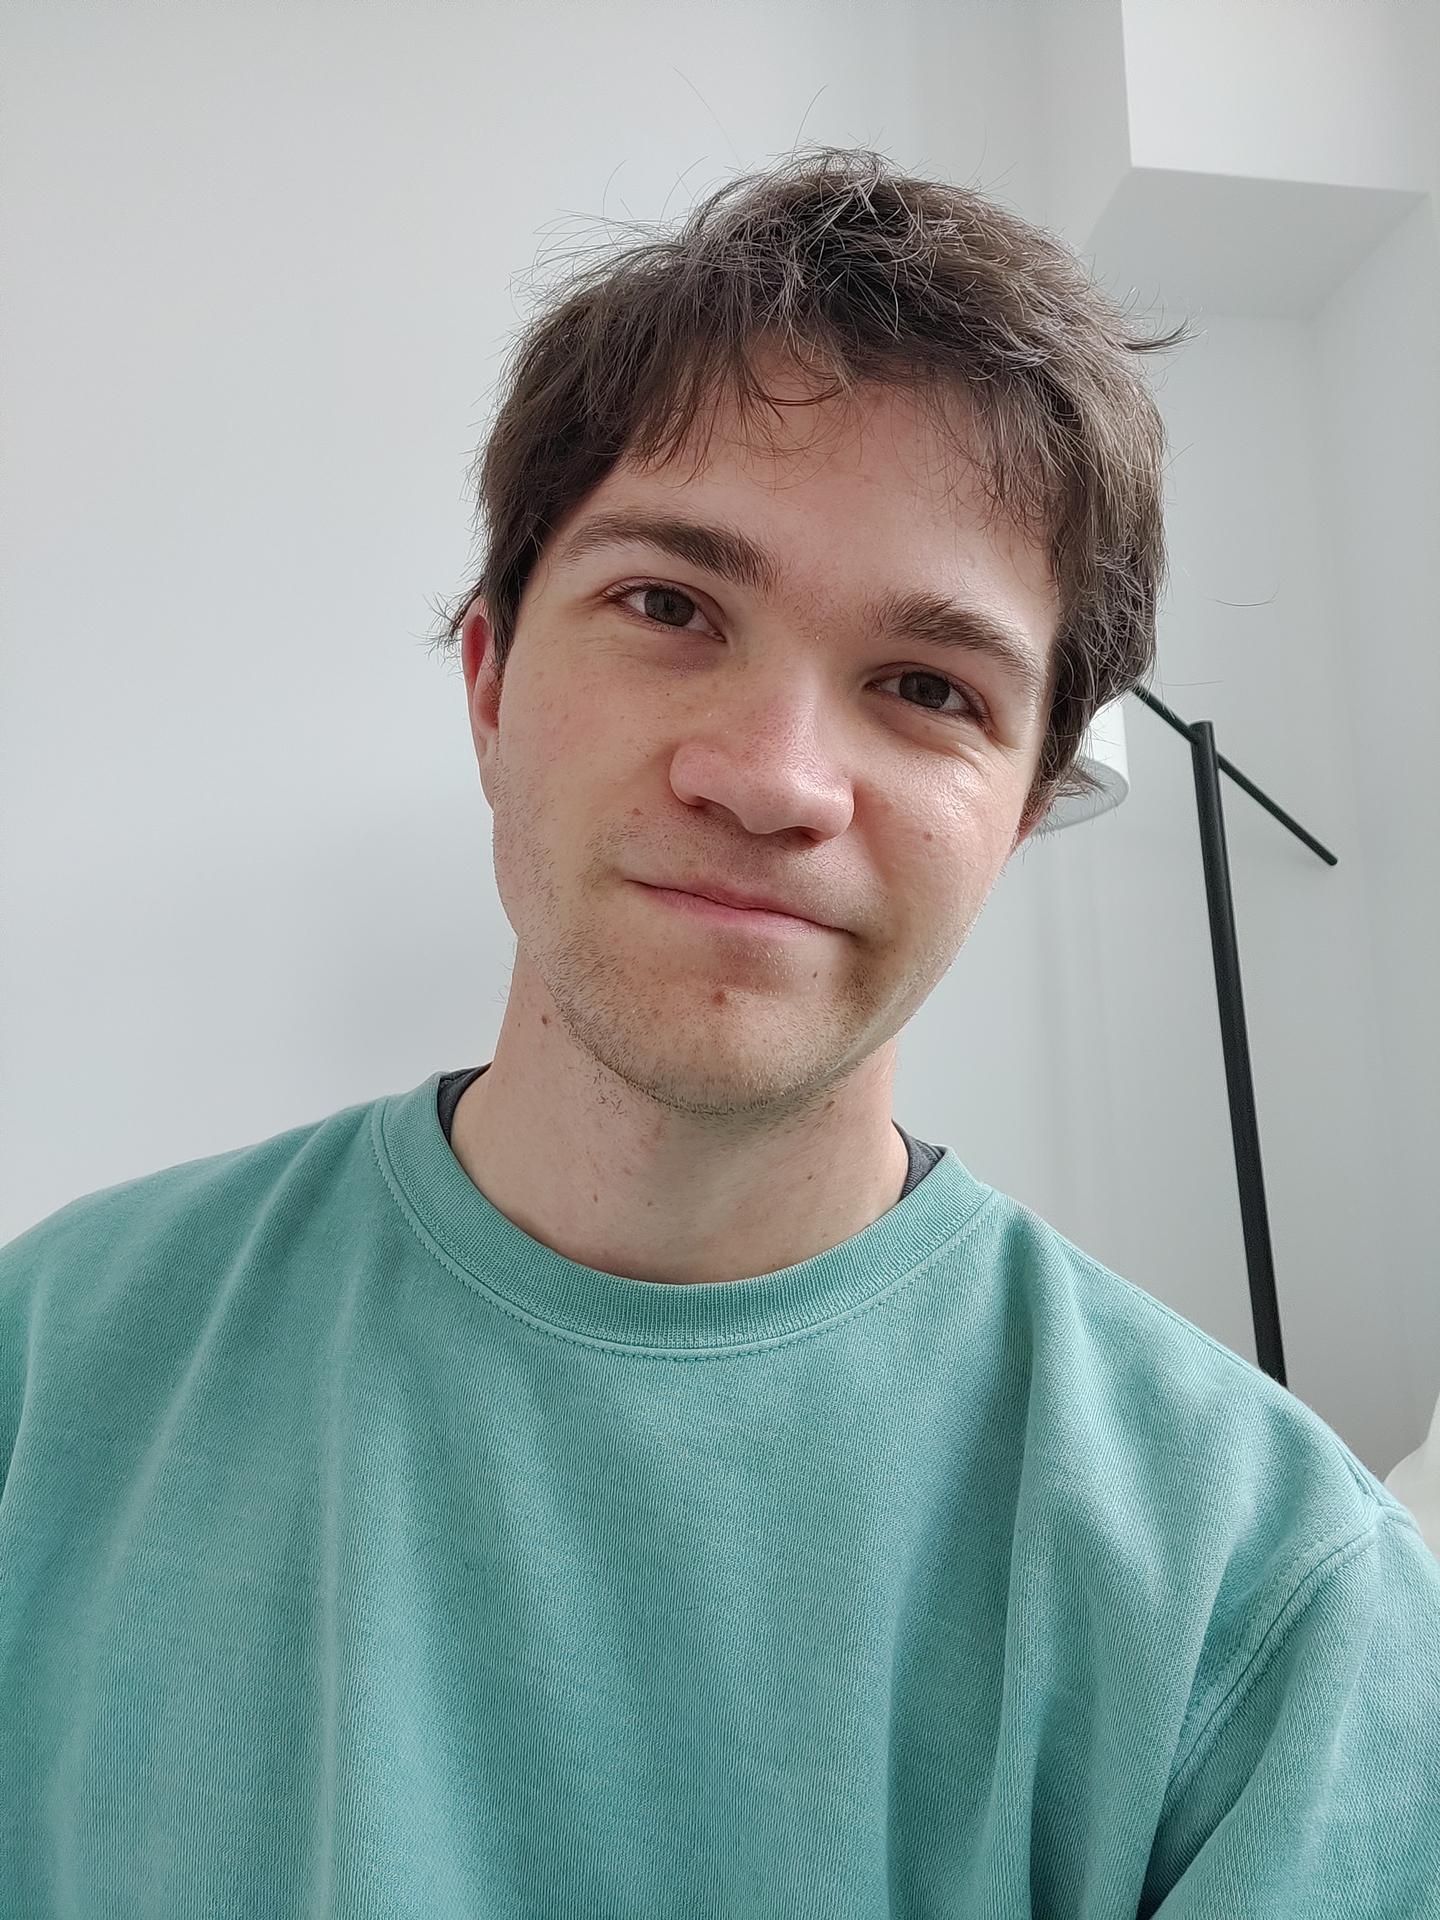 OnePlus 8 Pro sample image selfie 3